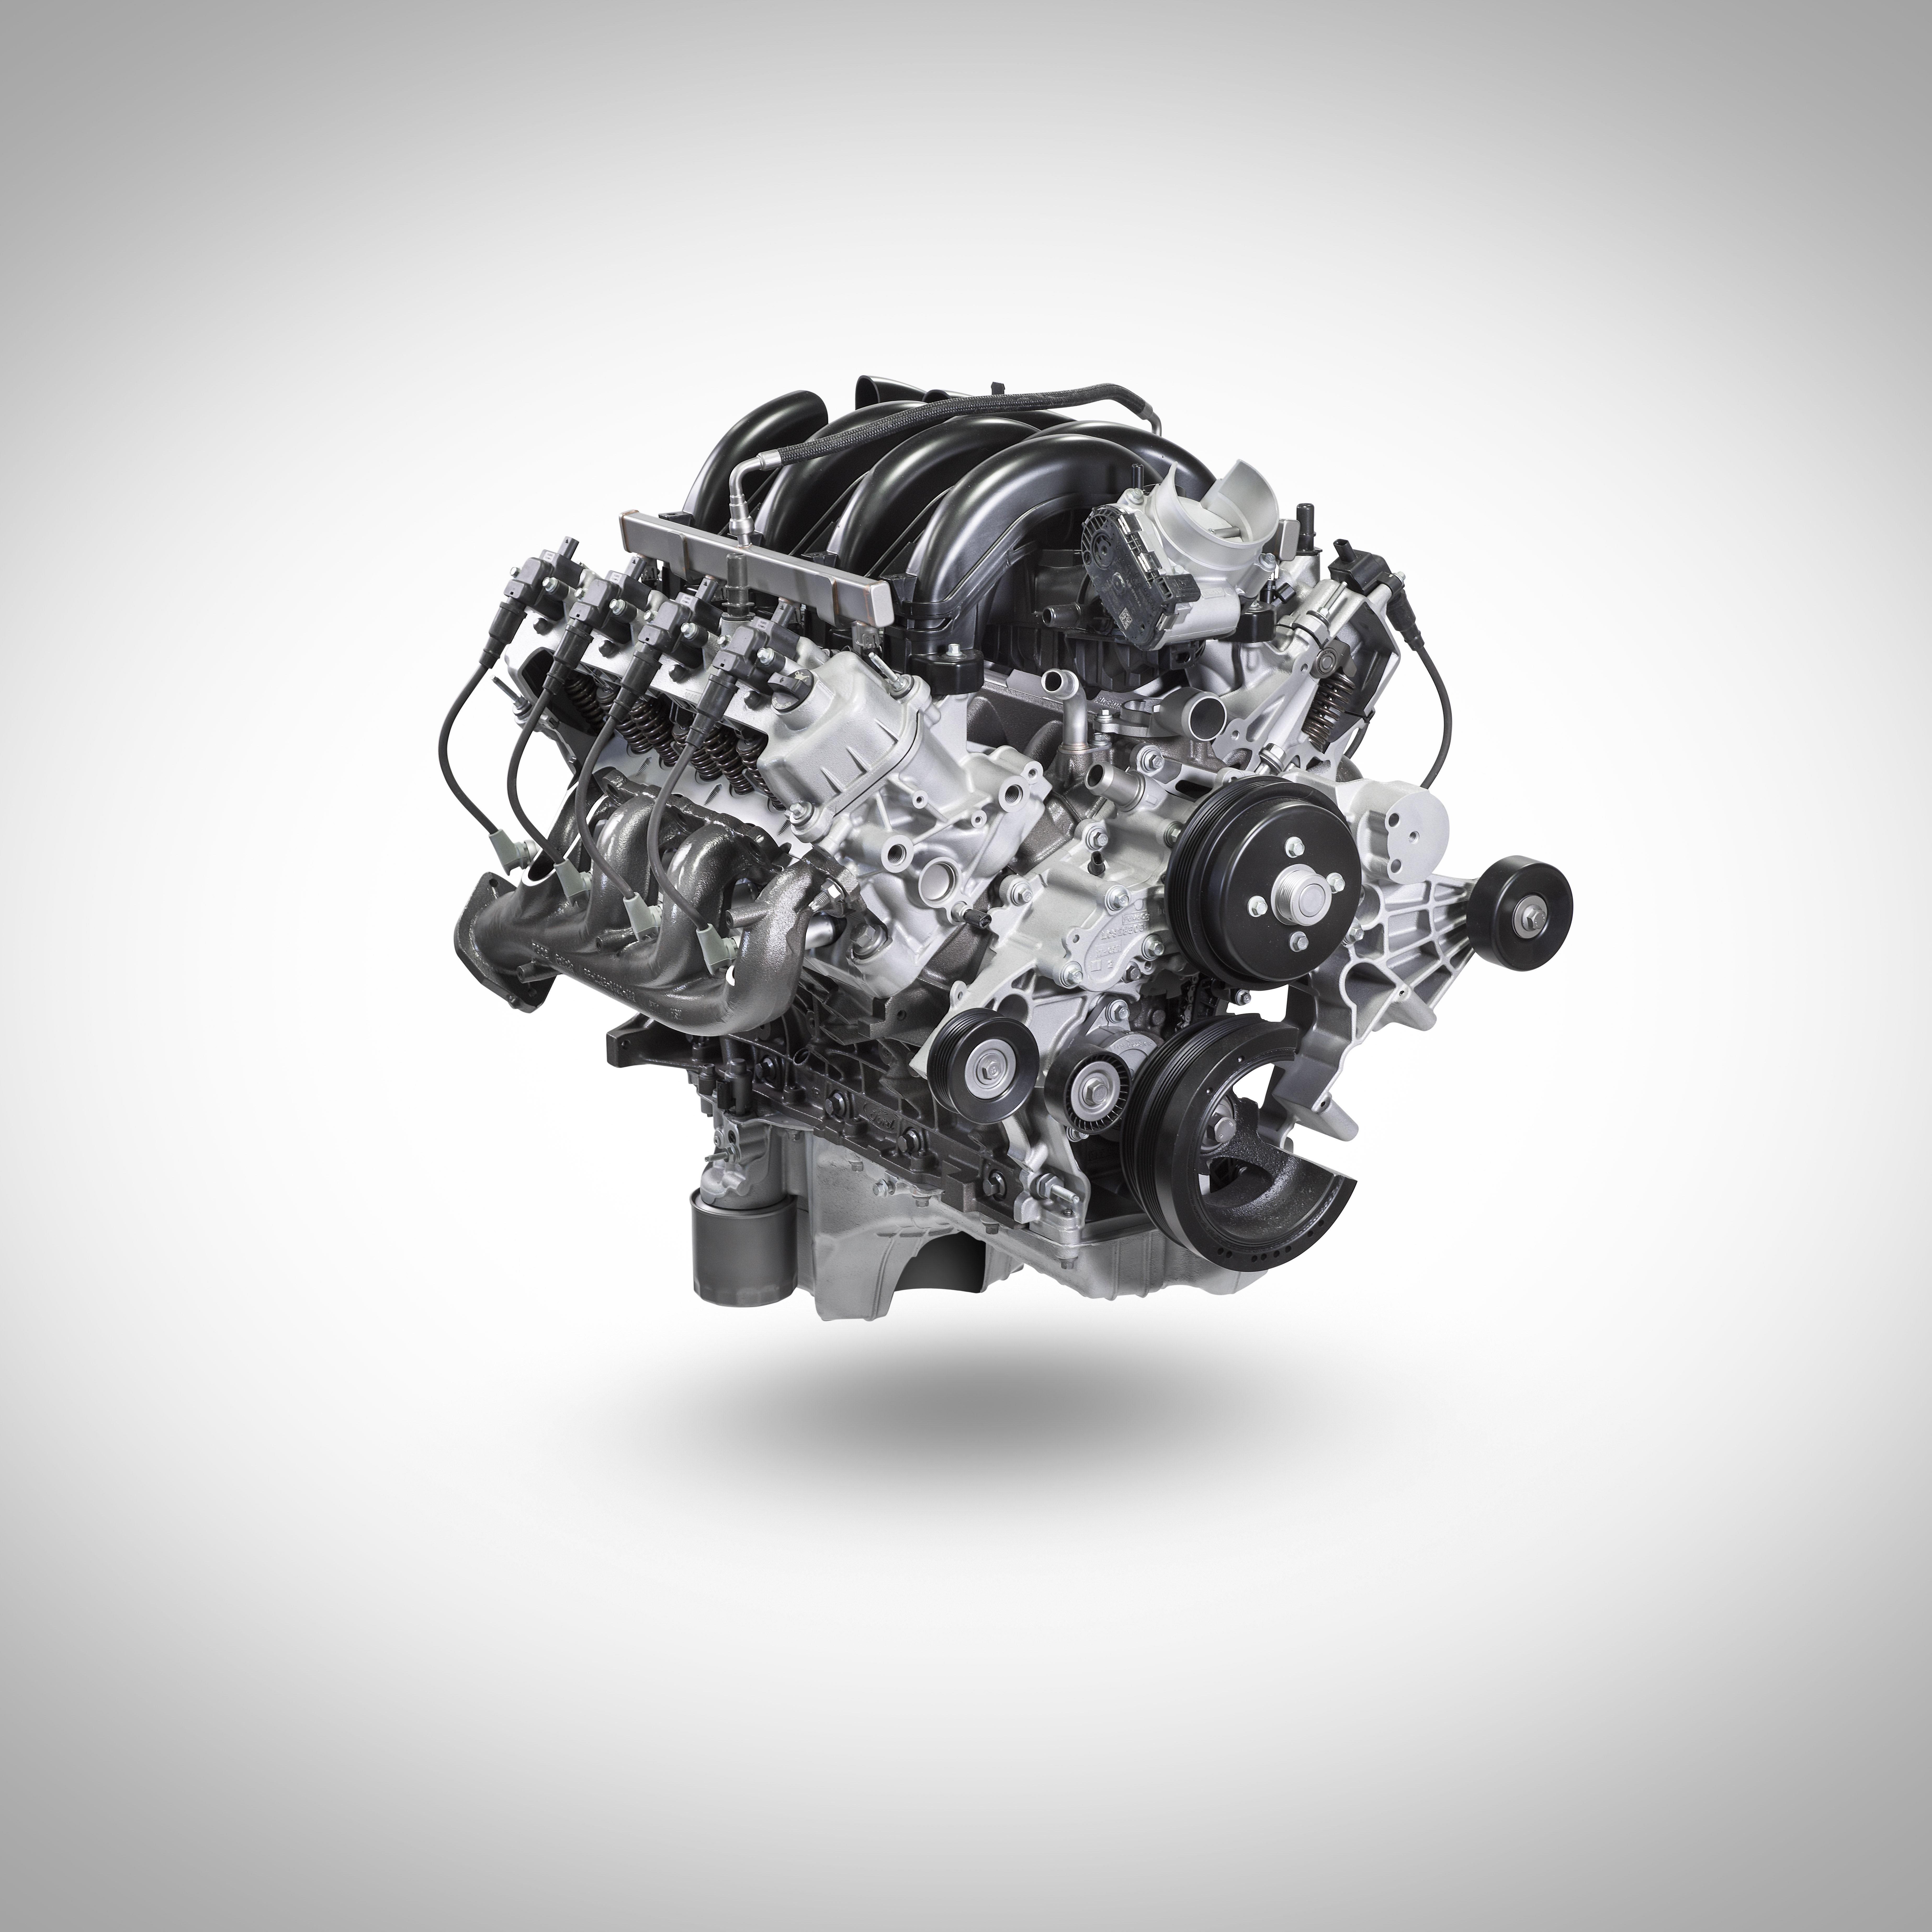 Watch: 600 HP 7.3L Godzilla V8 in a Fox Body Mustang